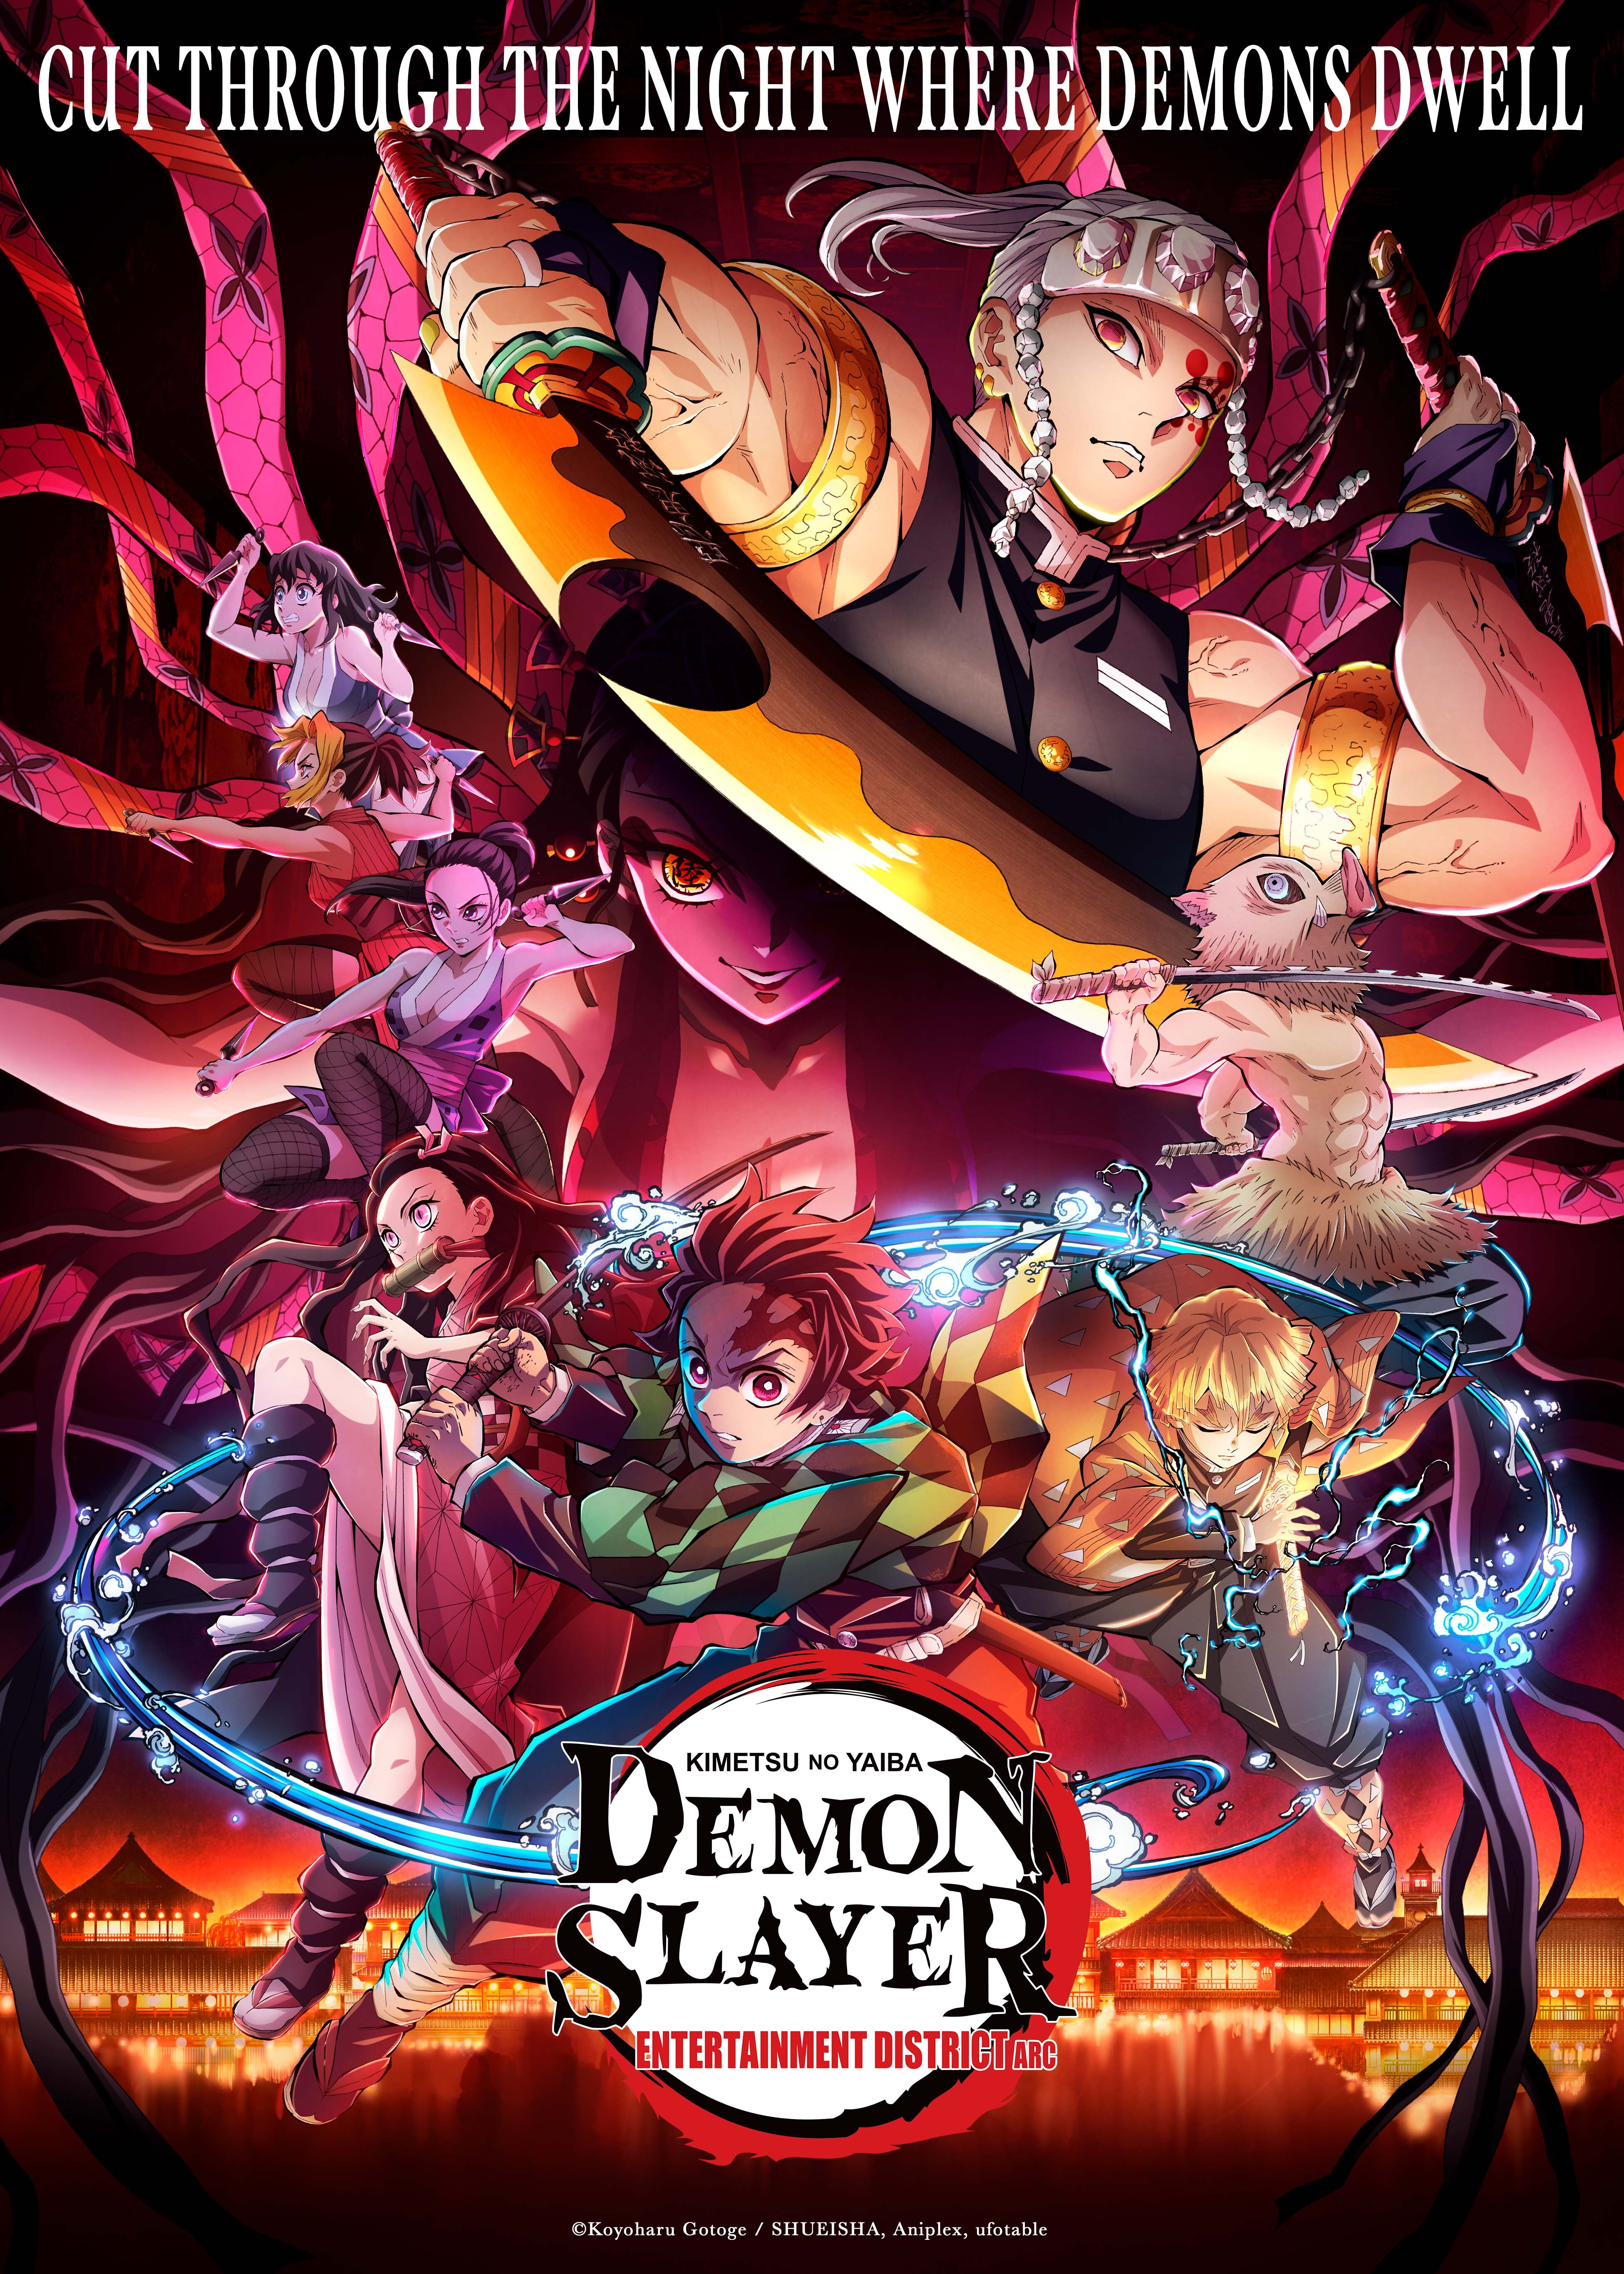 Demon Slayer: Kimetsu no Yaiba Entertainment District Arc